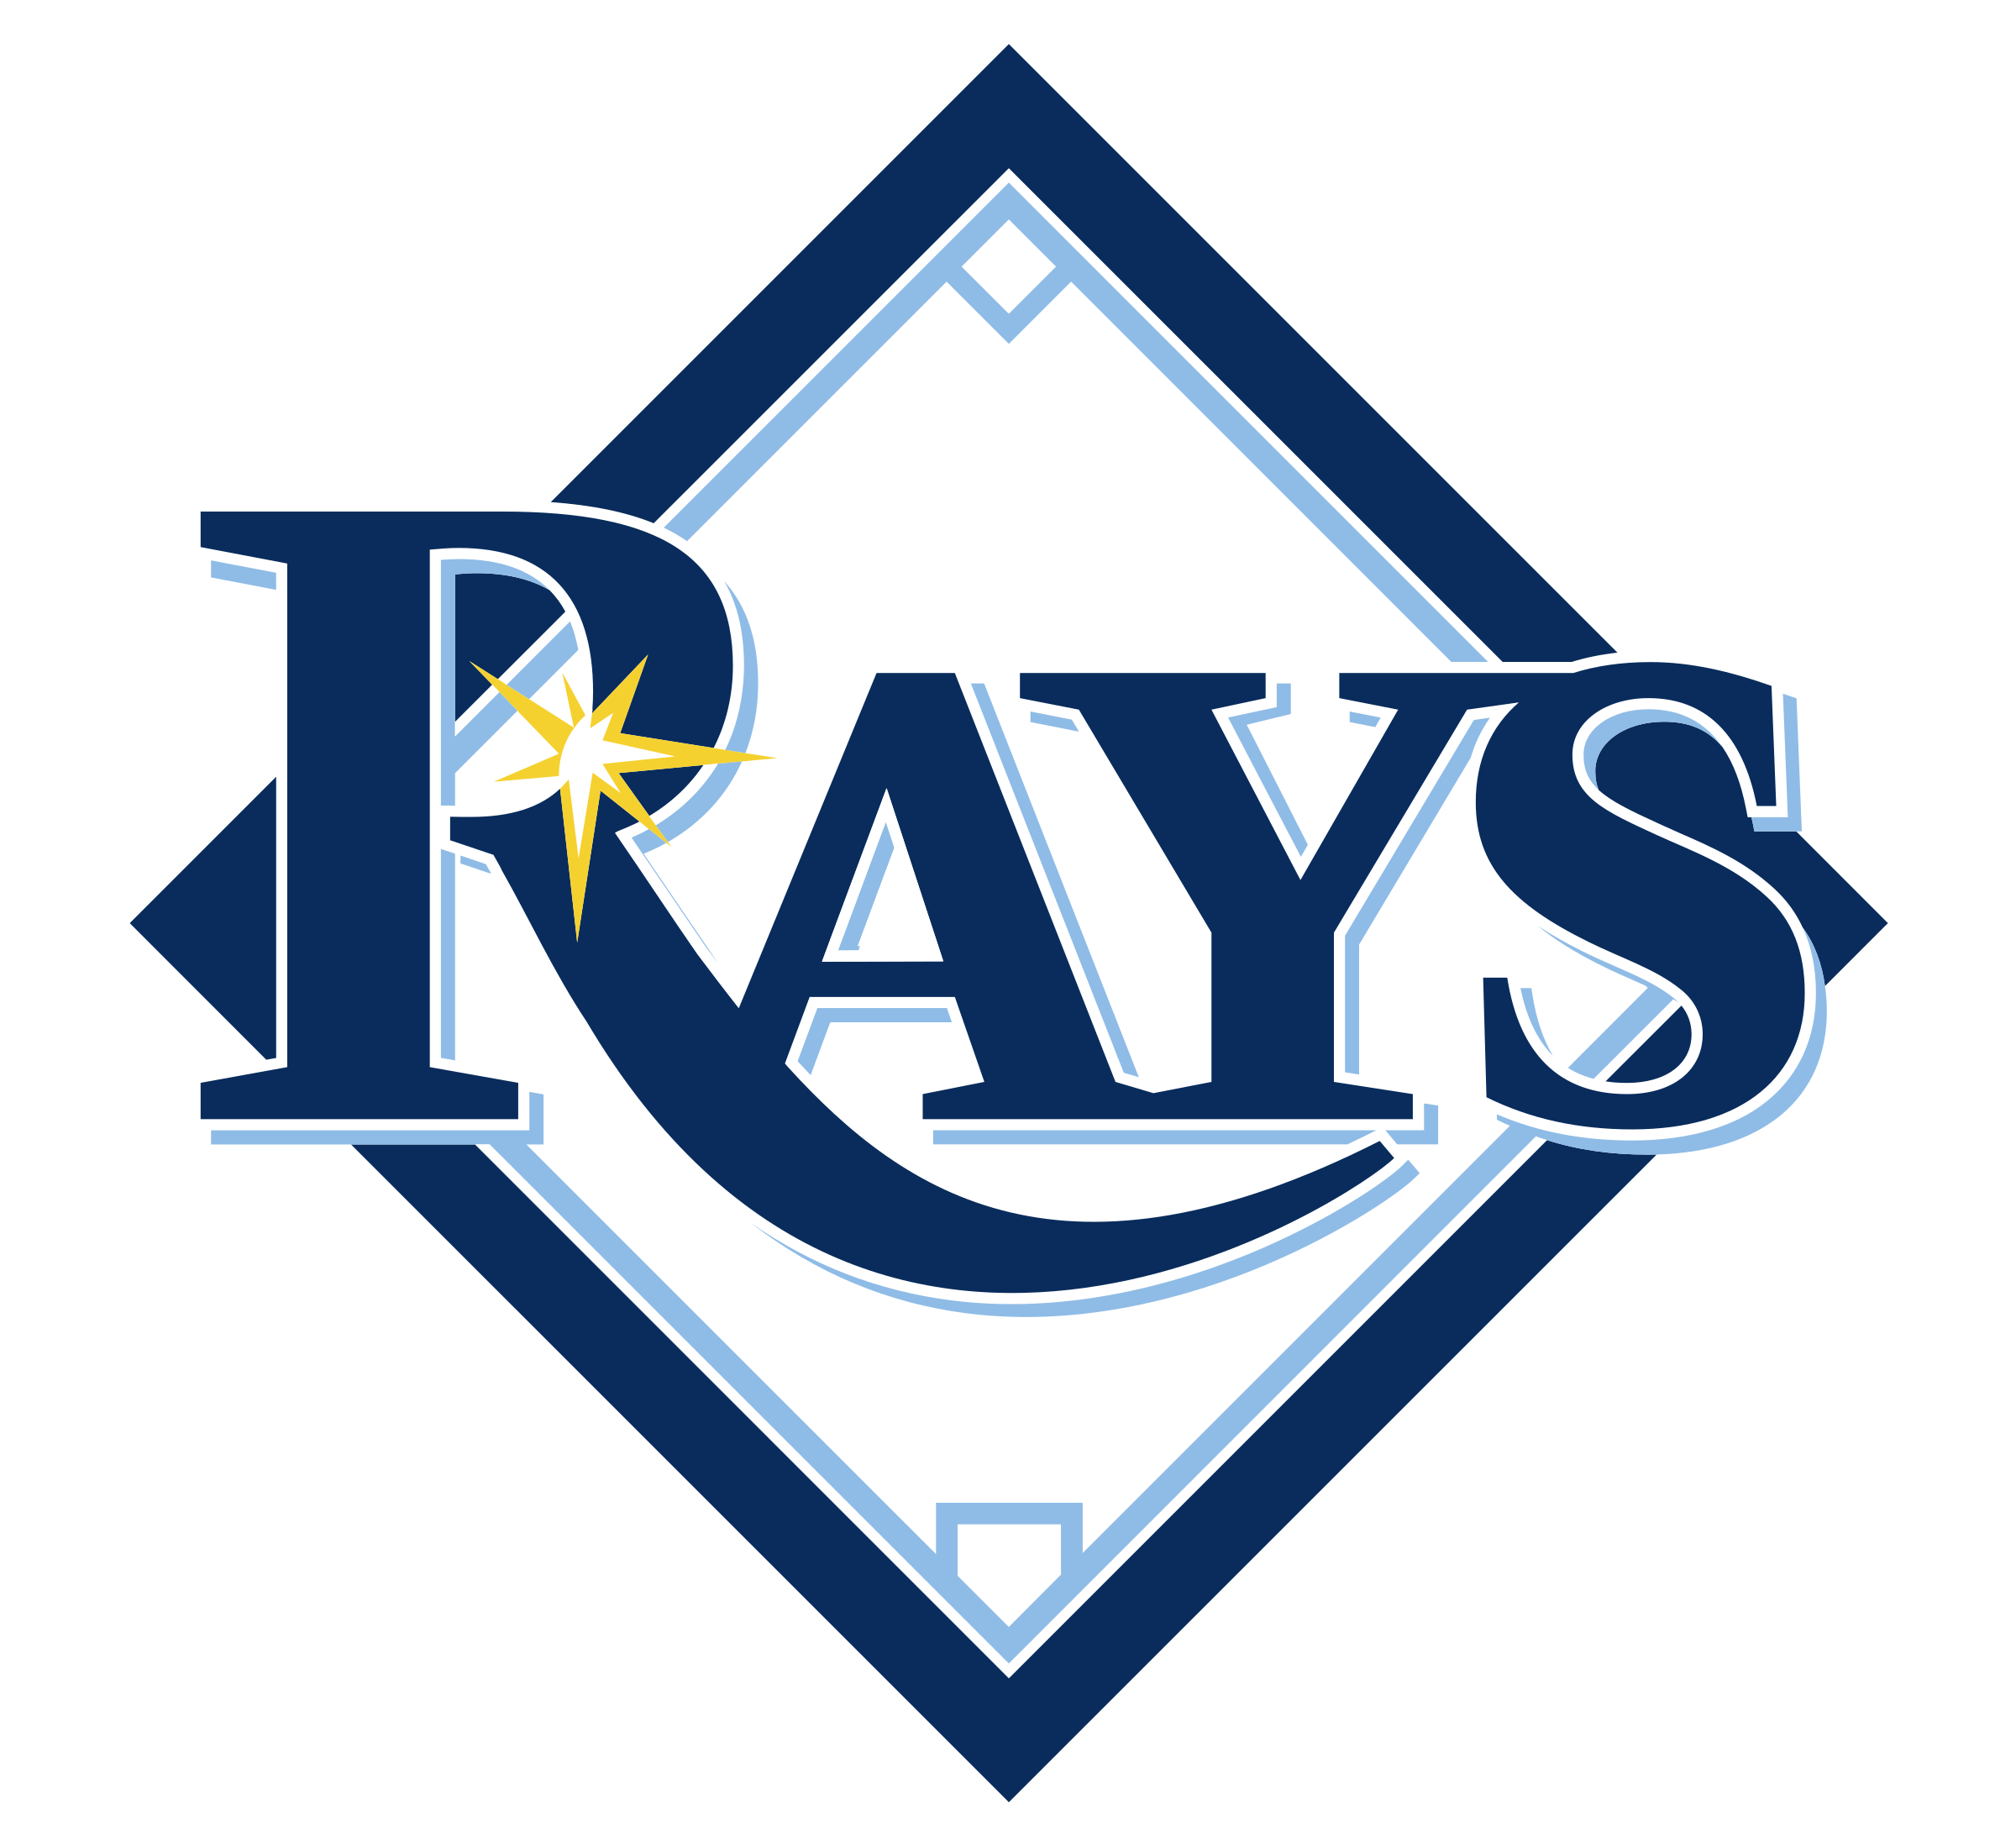 Tampa Bay Rays Logo Transparent